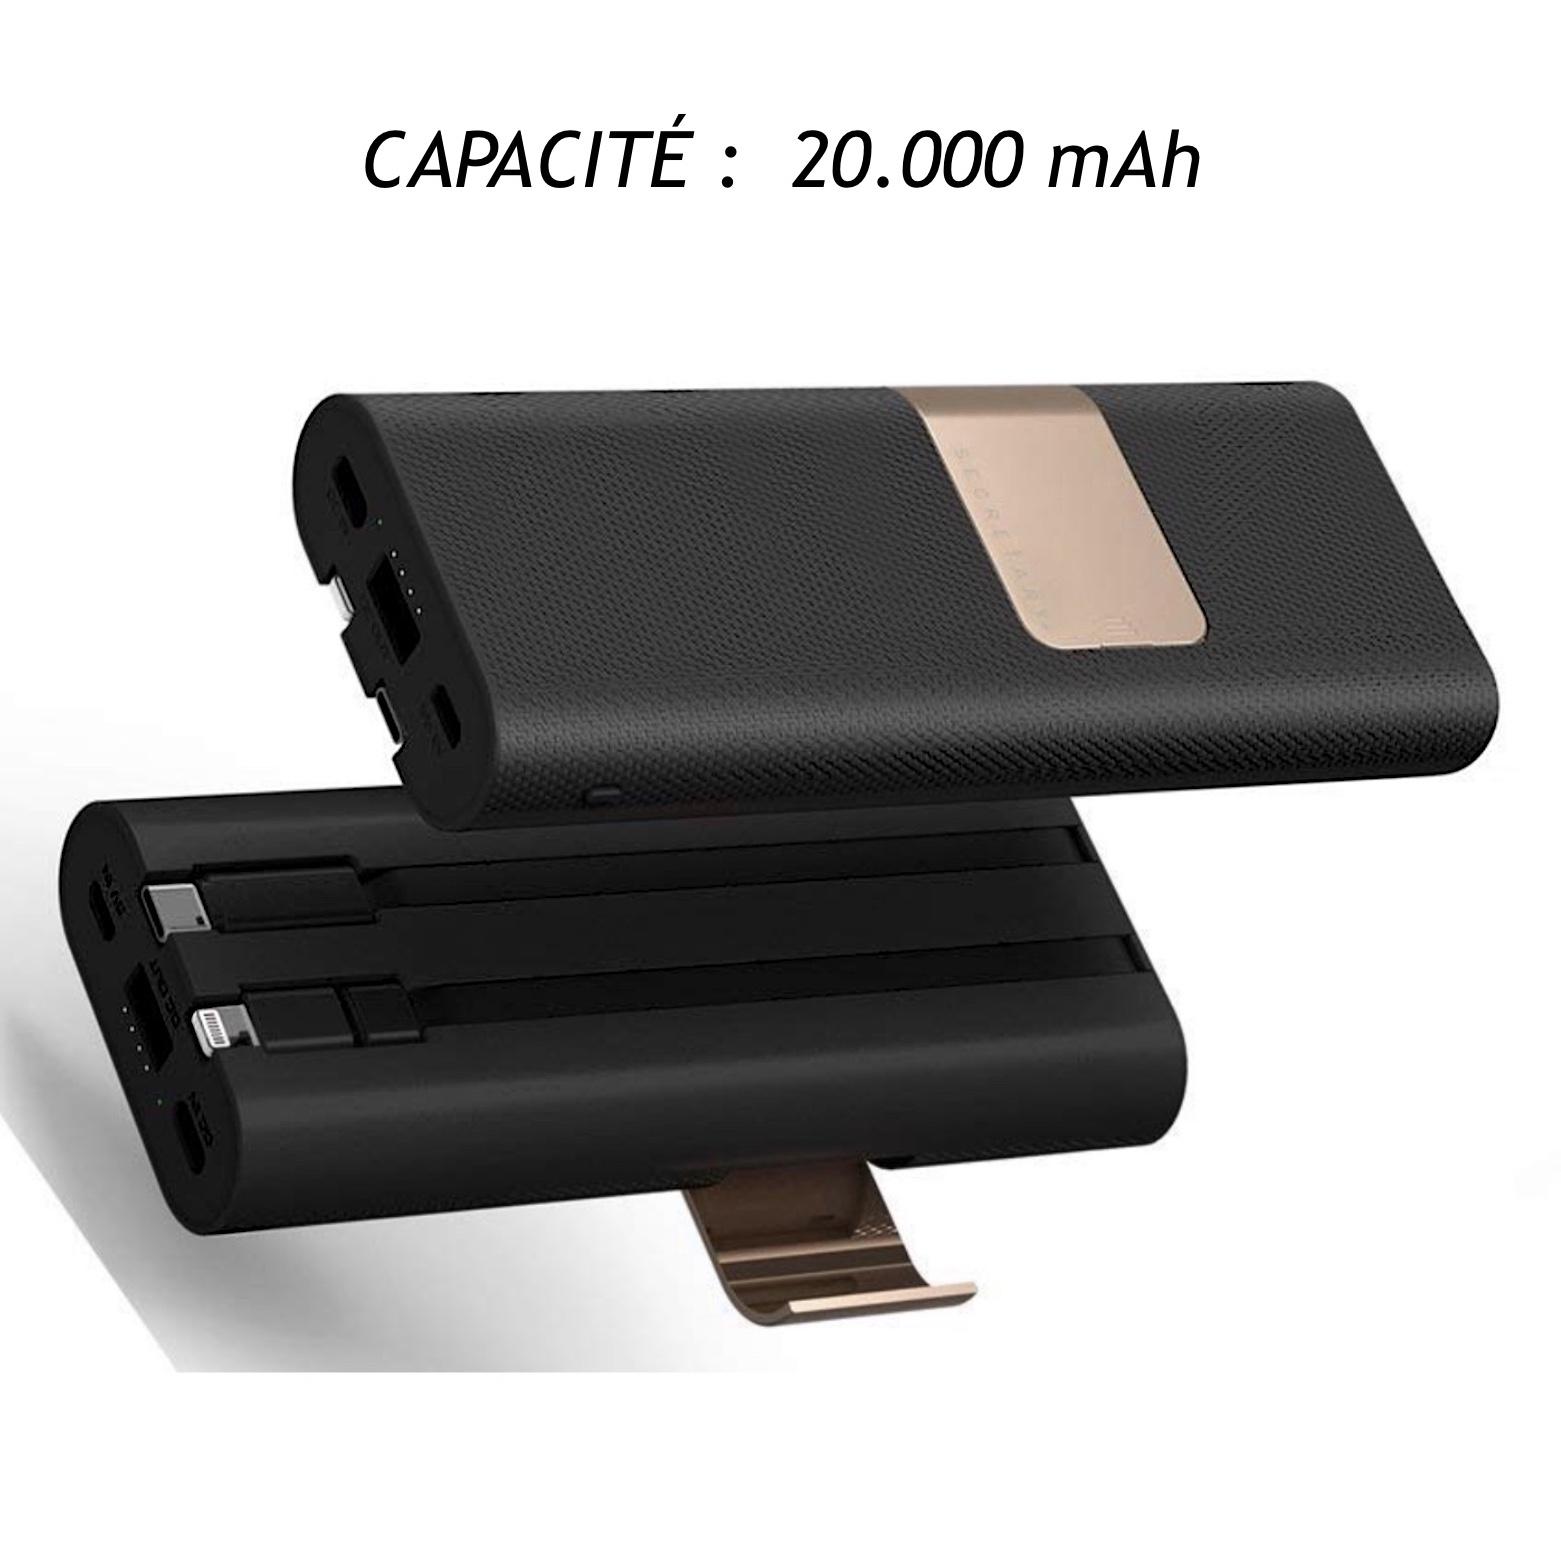 Batterie Universelle Gamme Professionnels 20000 mAh USB-C vers tablettes Samsung USB-C et Lightning